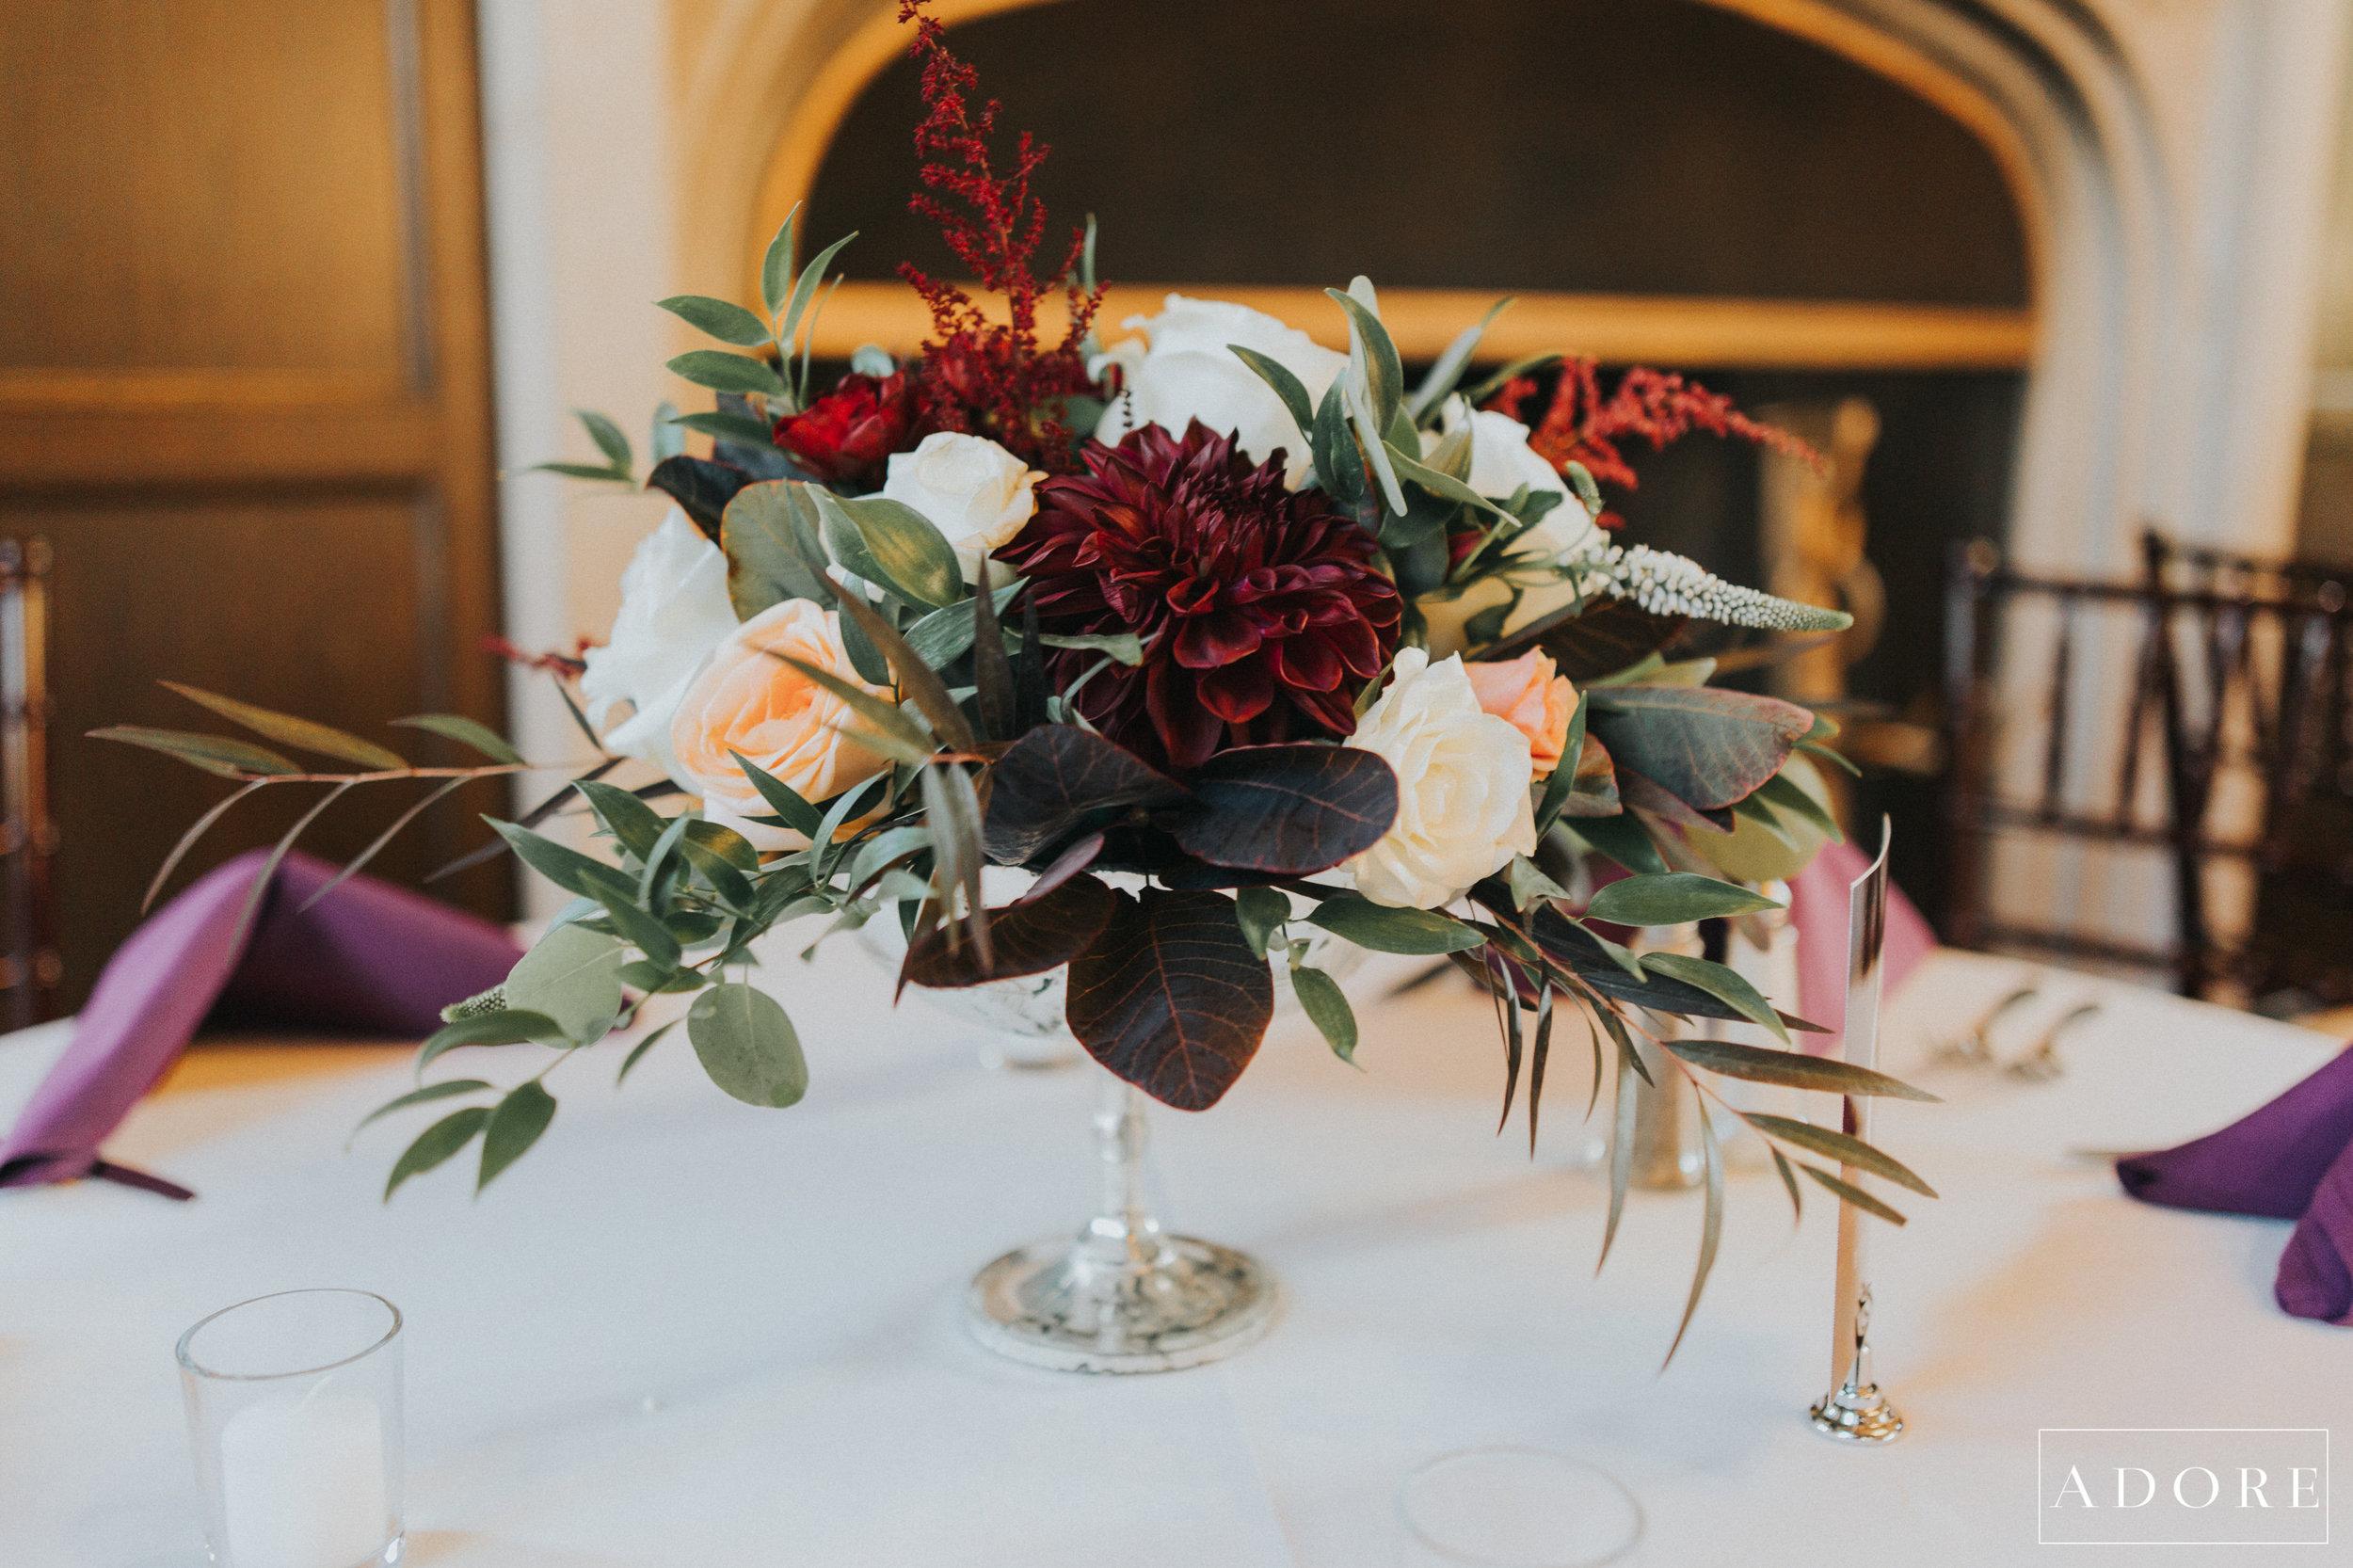 Adore Wedding Photography-15765.jpg